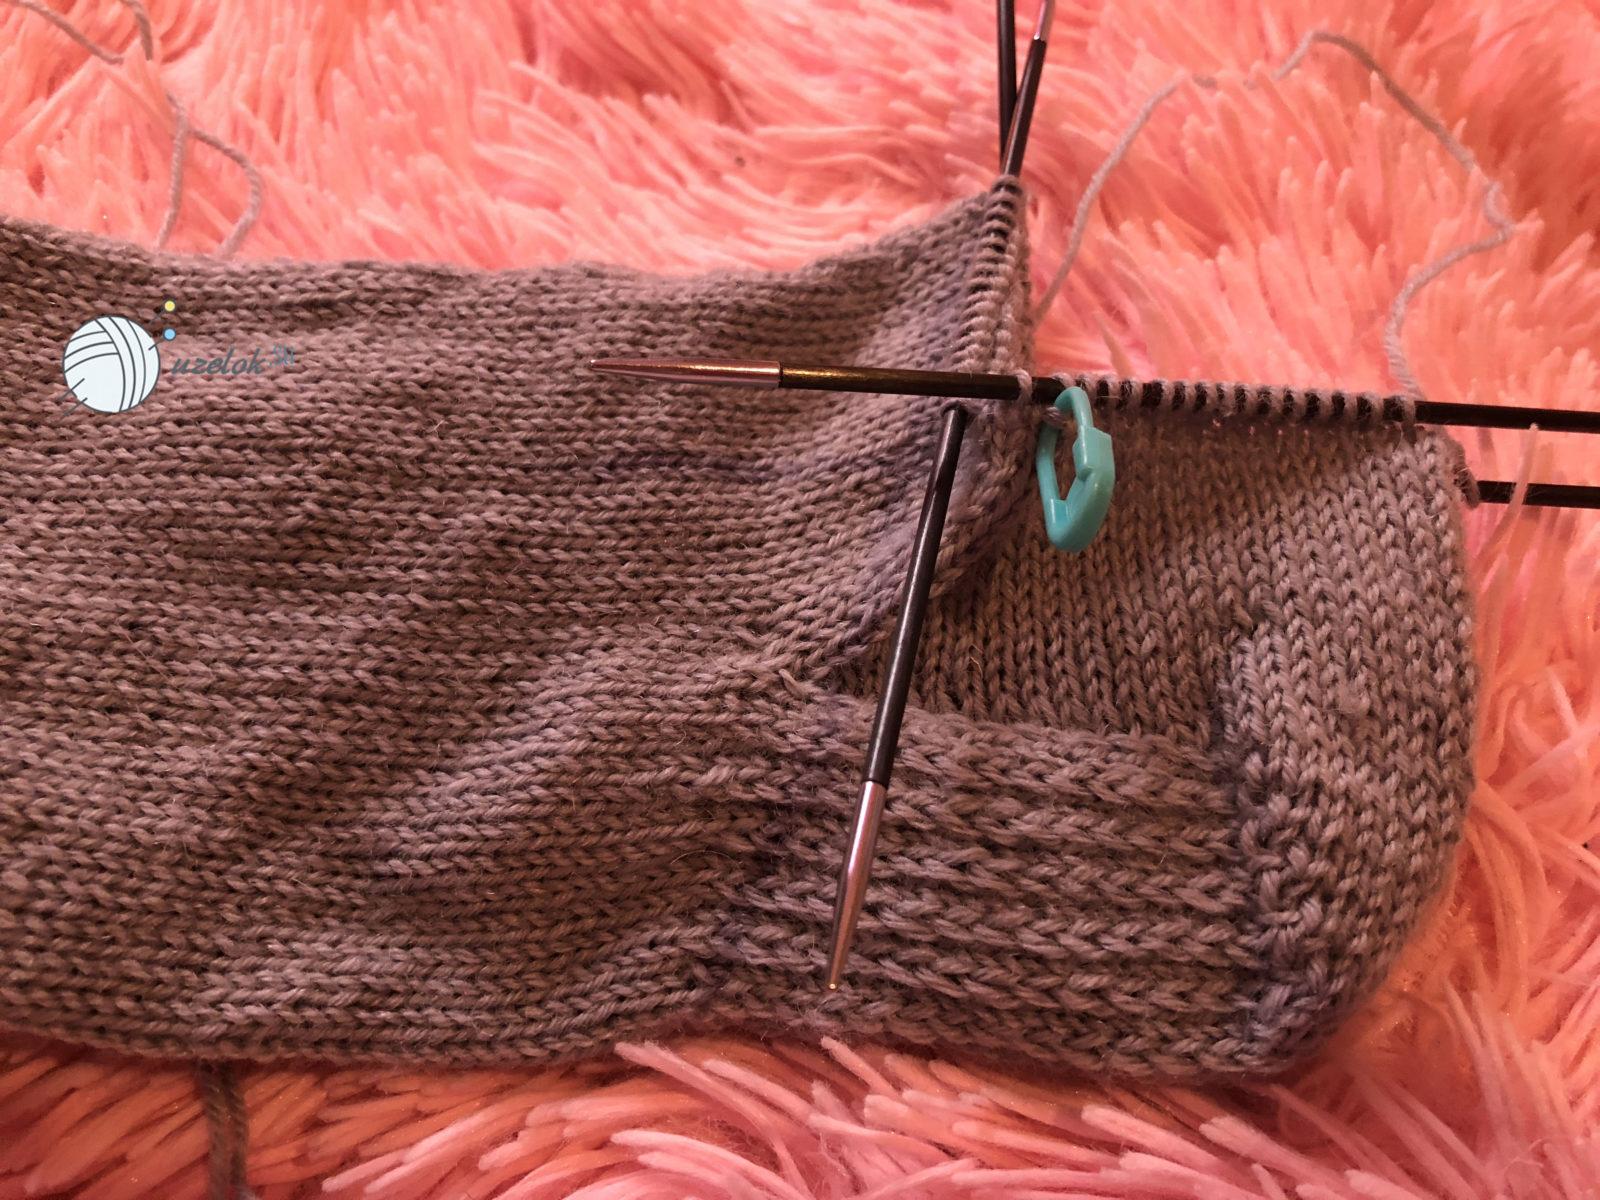 мужские носки спицами размер 42 43 пошаговое описание с фото и